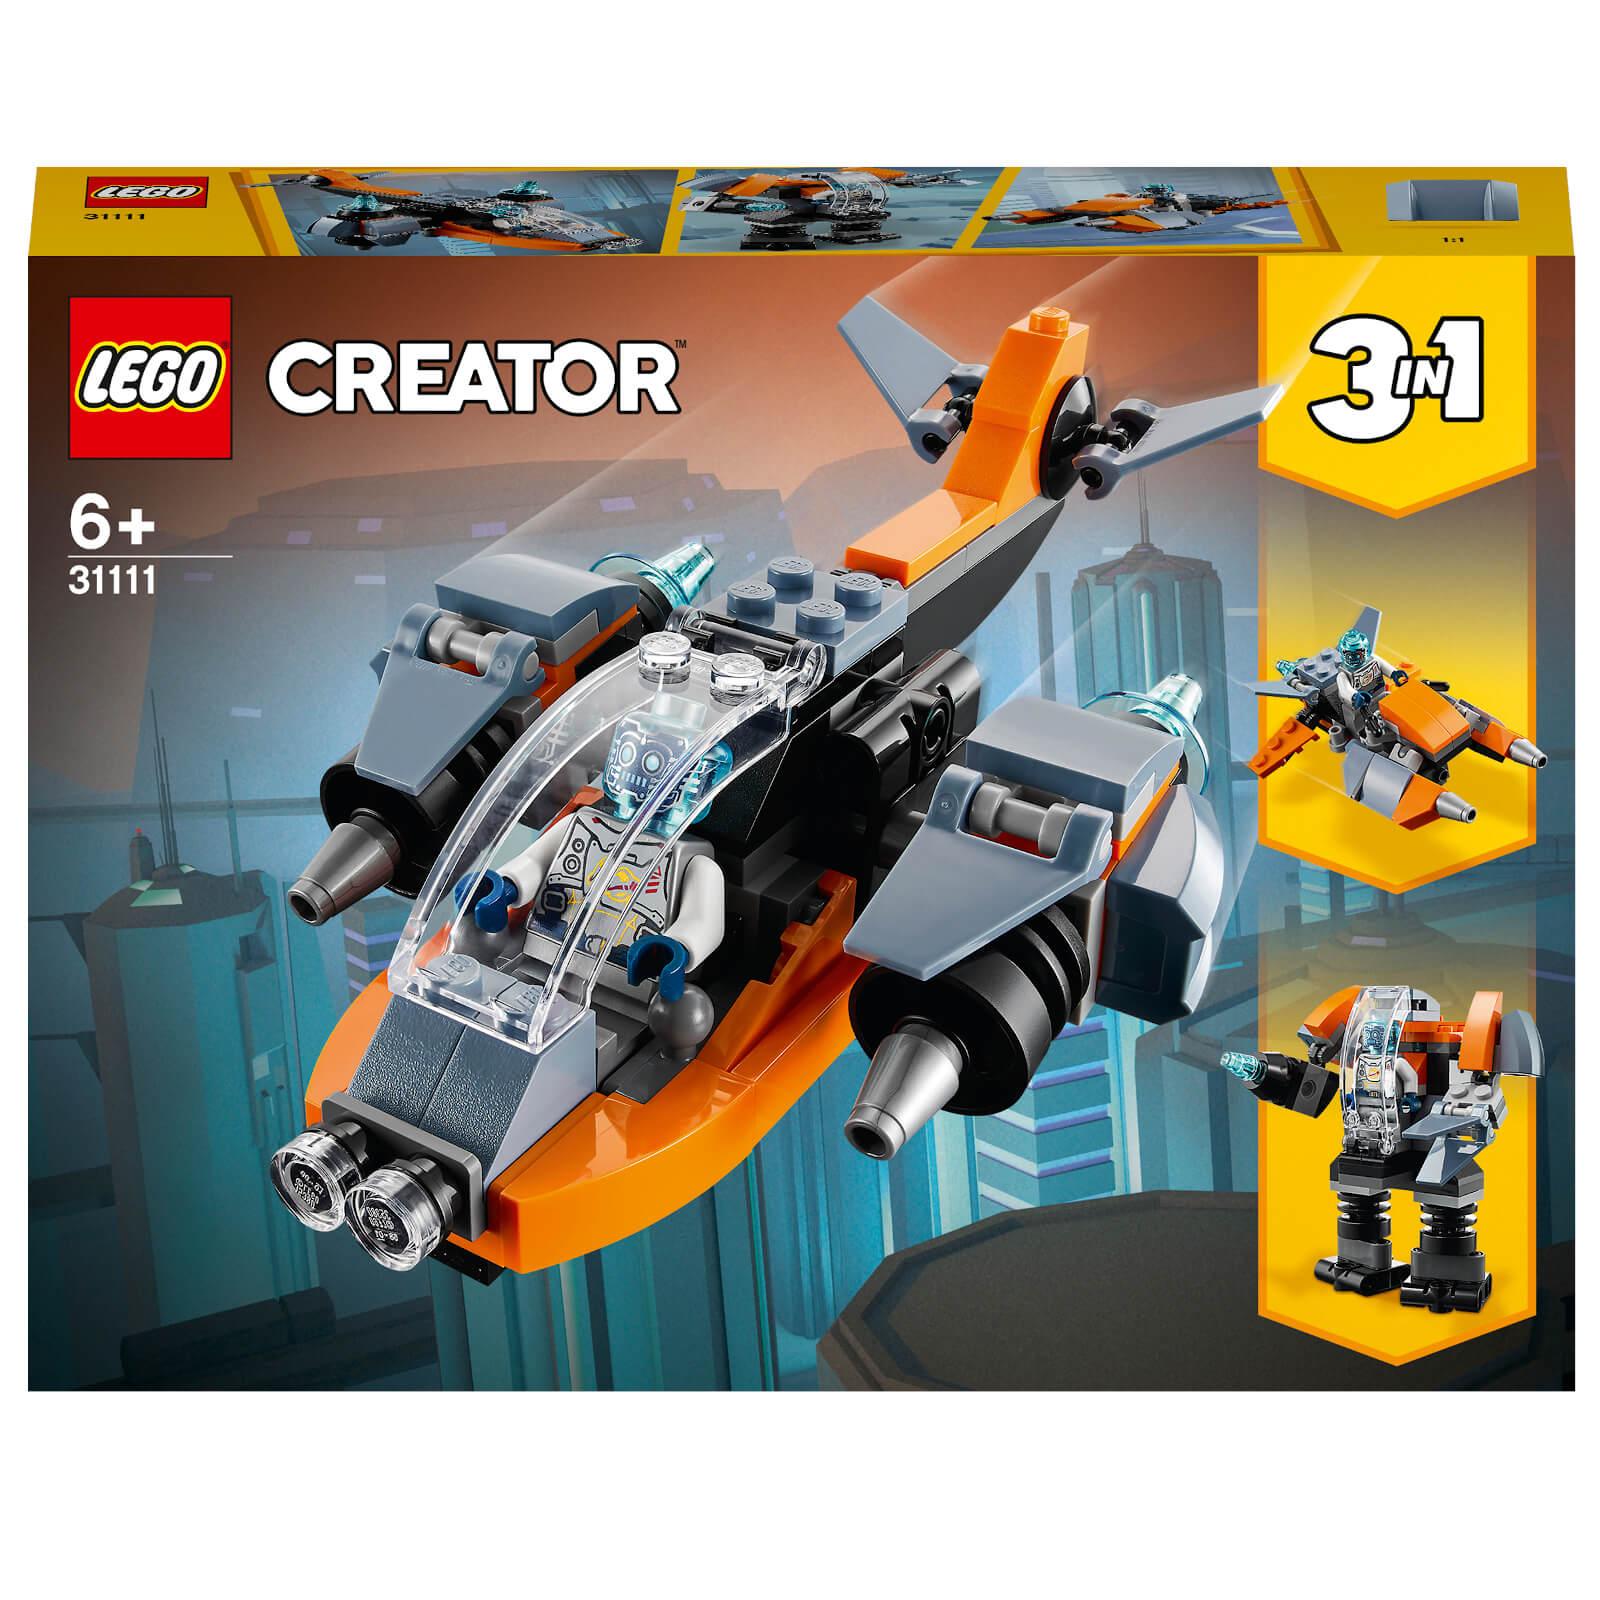 Image of LEGO Creator Cyber Drone - 31111